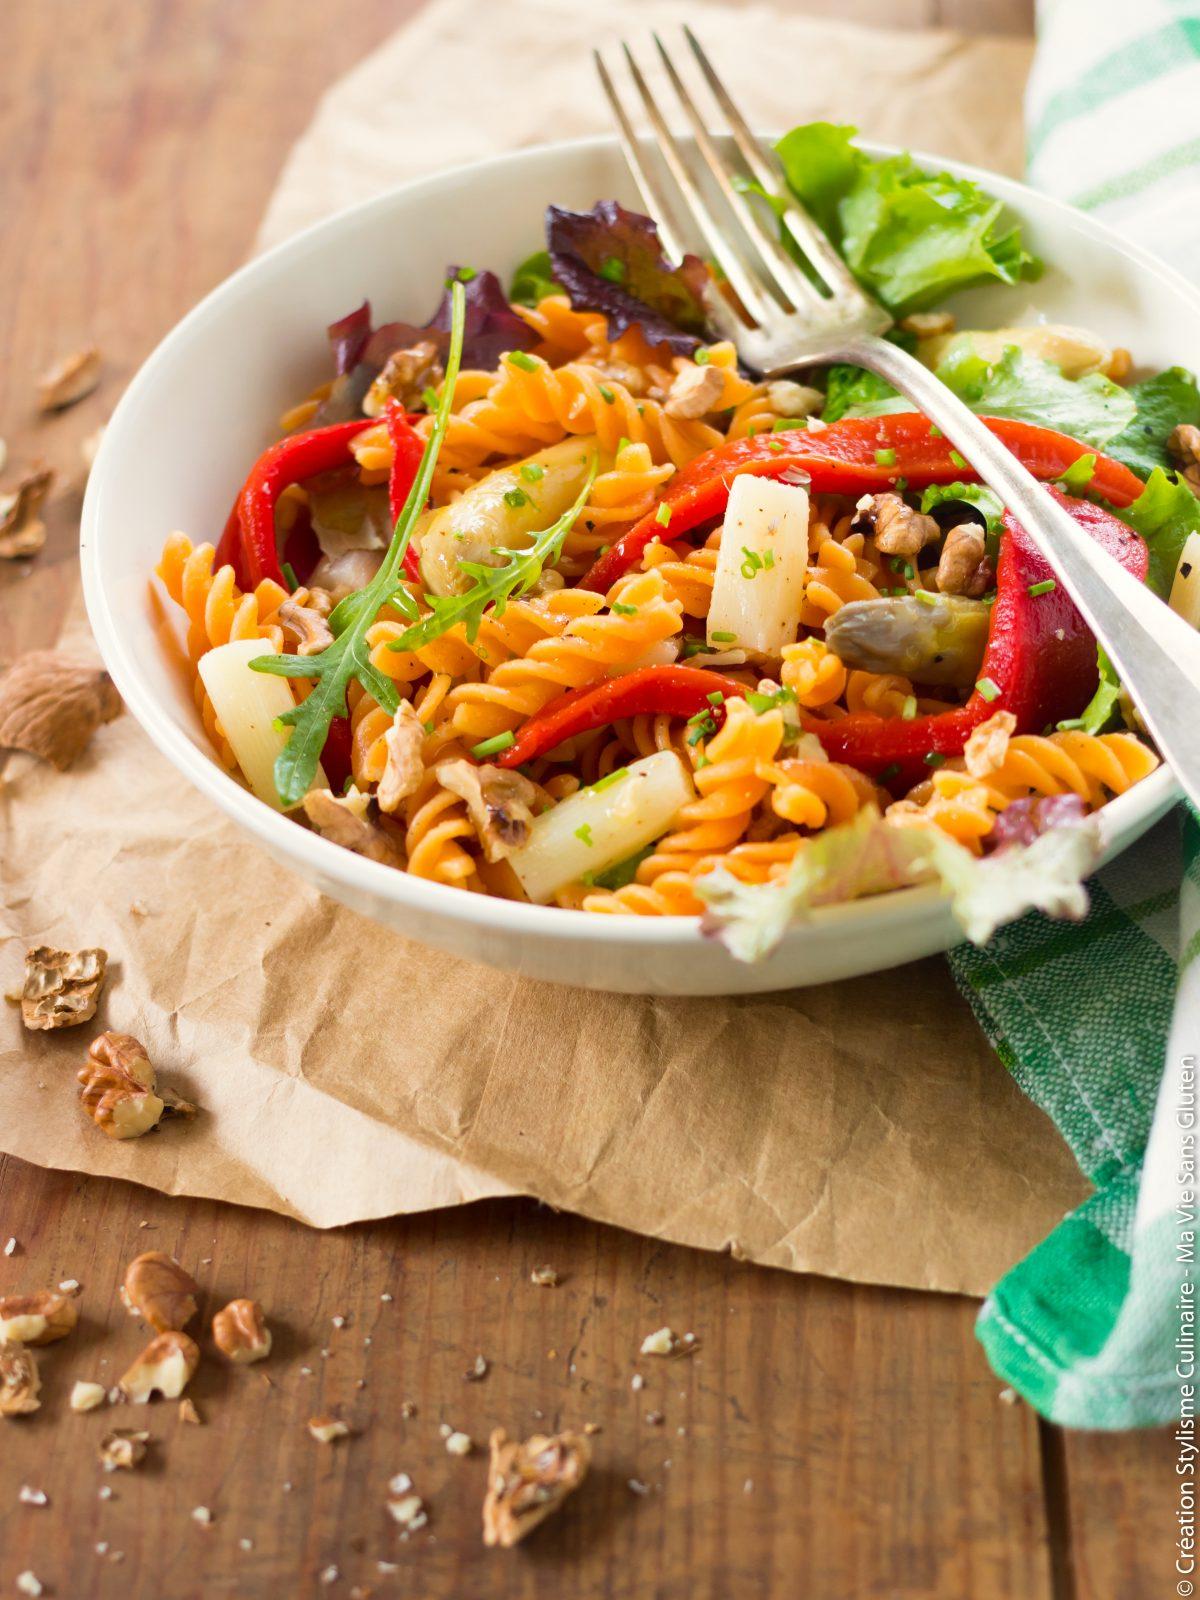 salade de fusili lentilles corail-4